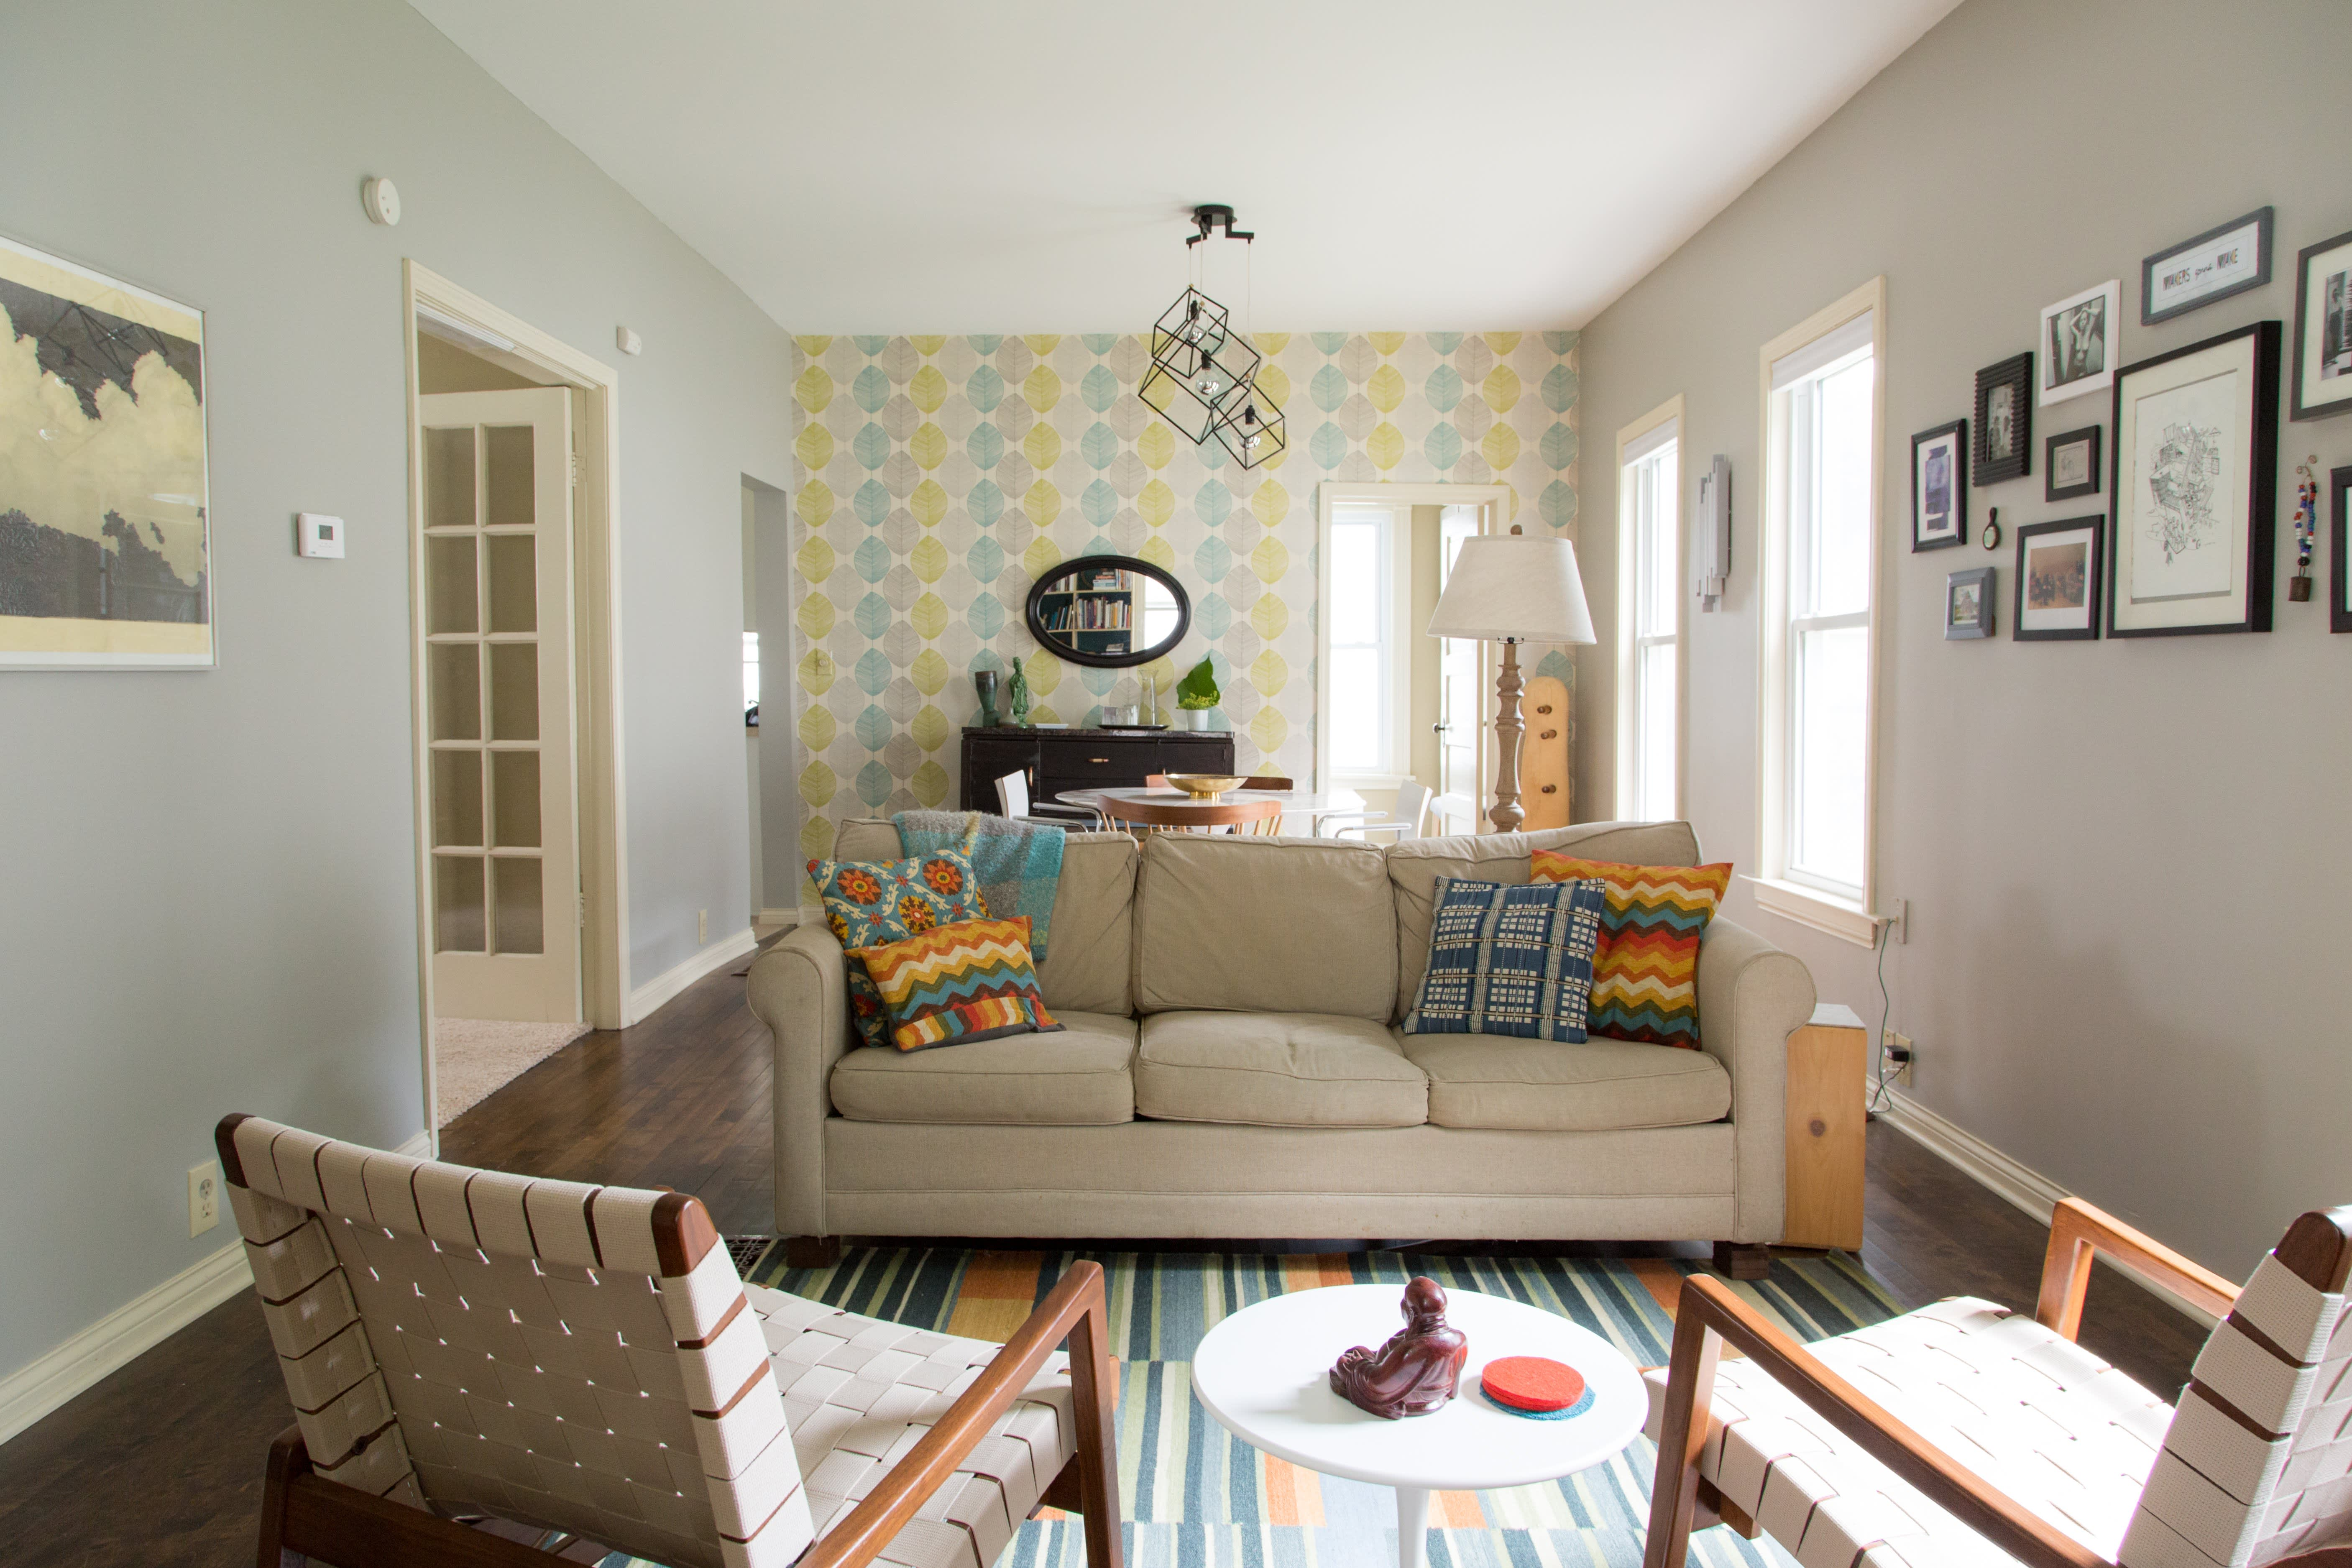 House Tour: A Cozy & Creative DIY Minneapolis Retreat ...